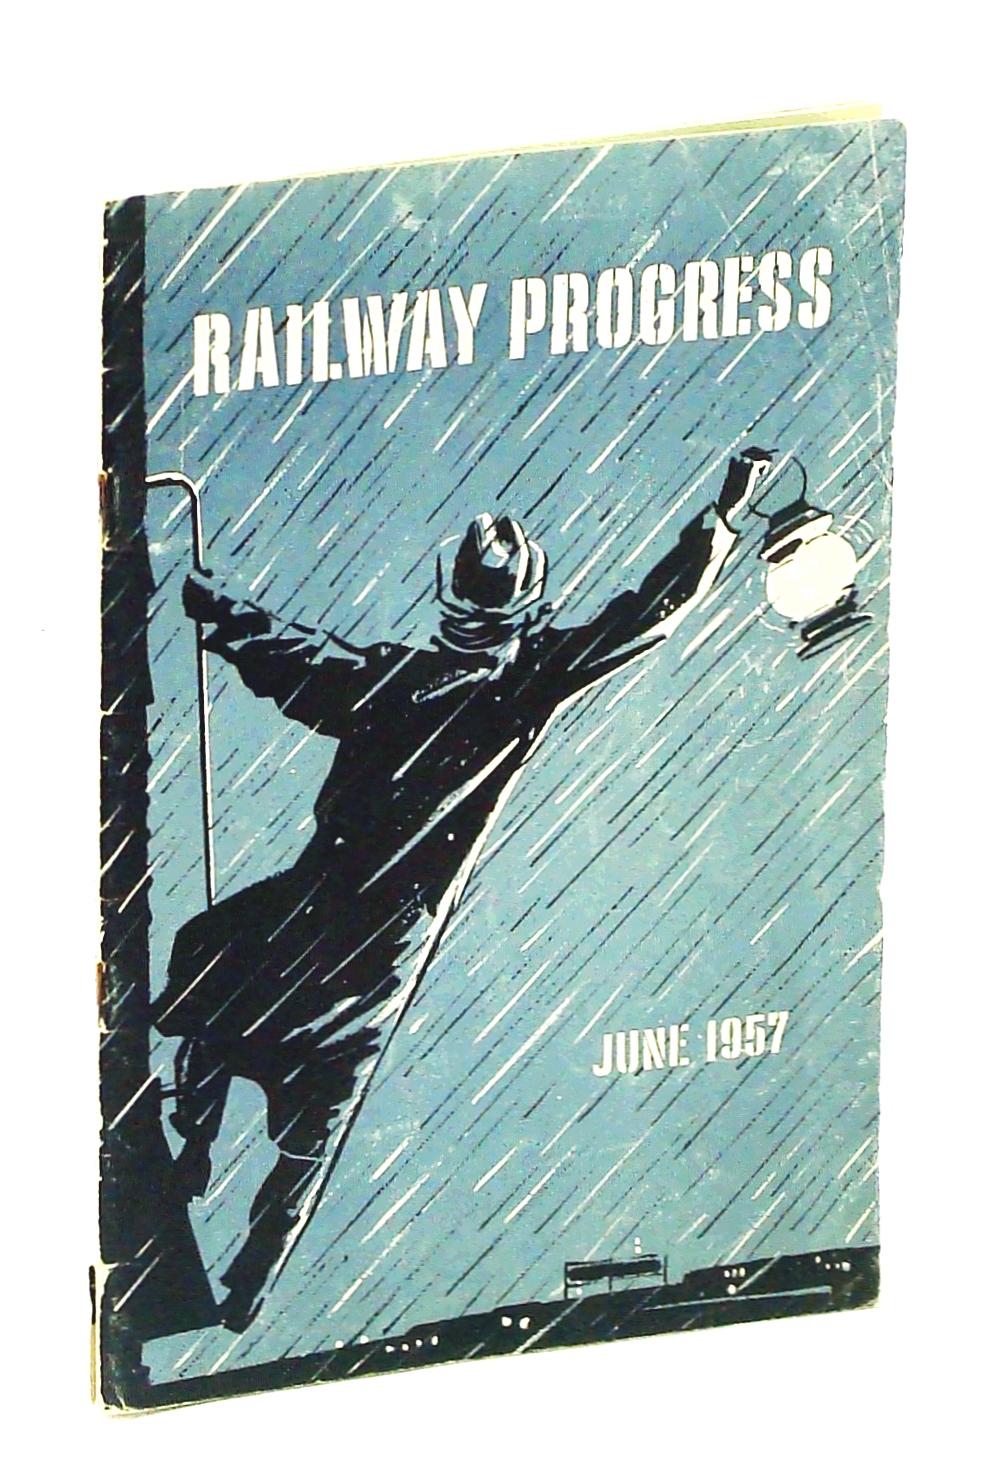 Image for Railway Progress [Magazine], June 1957, Vol. XI, No. 4: California to Las Vegas Via Union Pacific